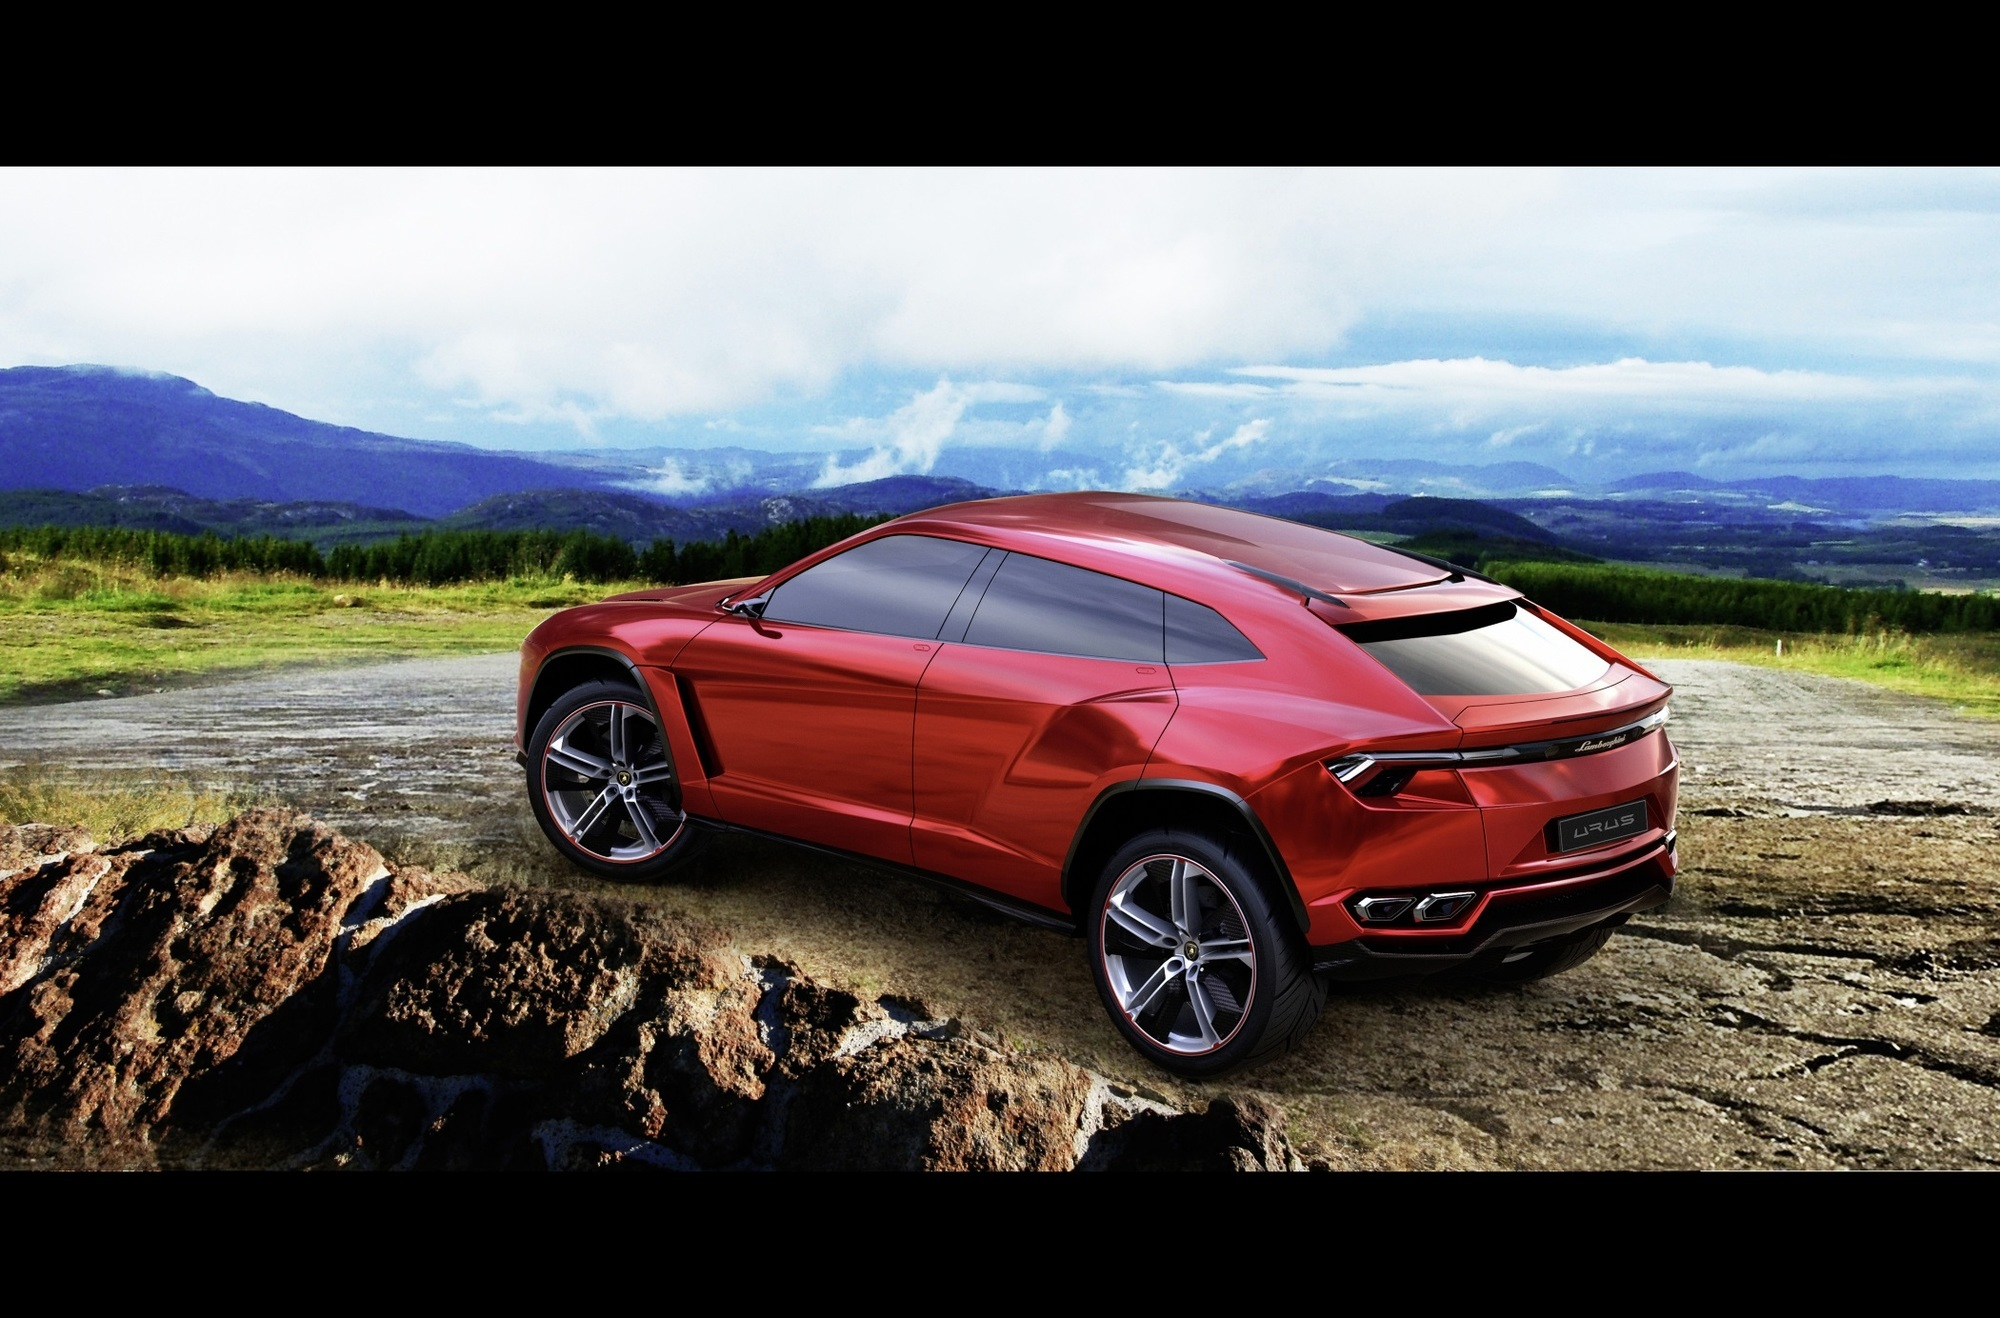 Neues Lamborghini-SUV - Der will hoch hinaus